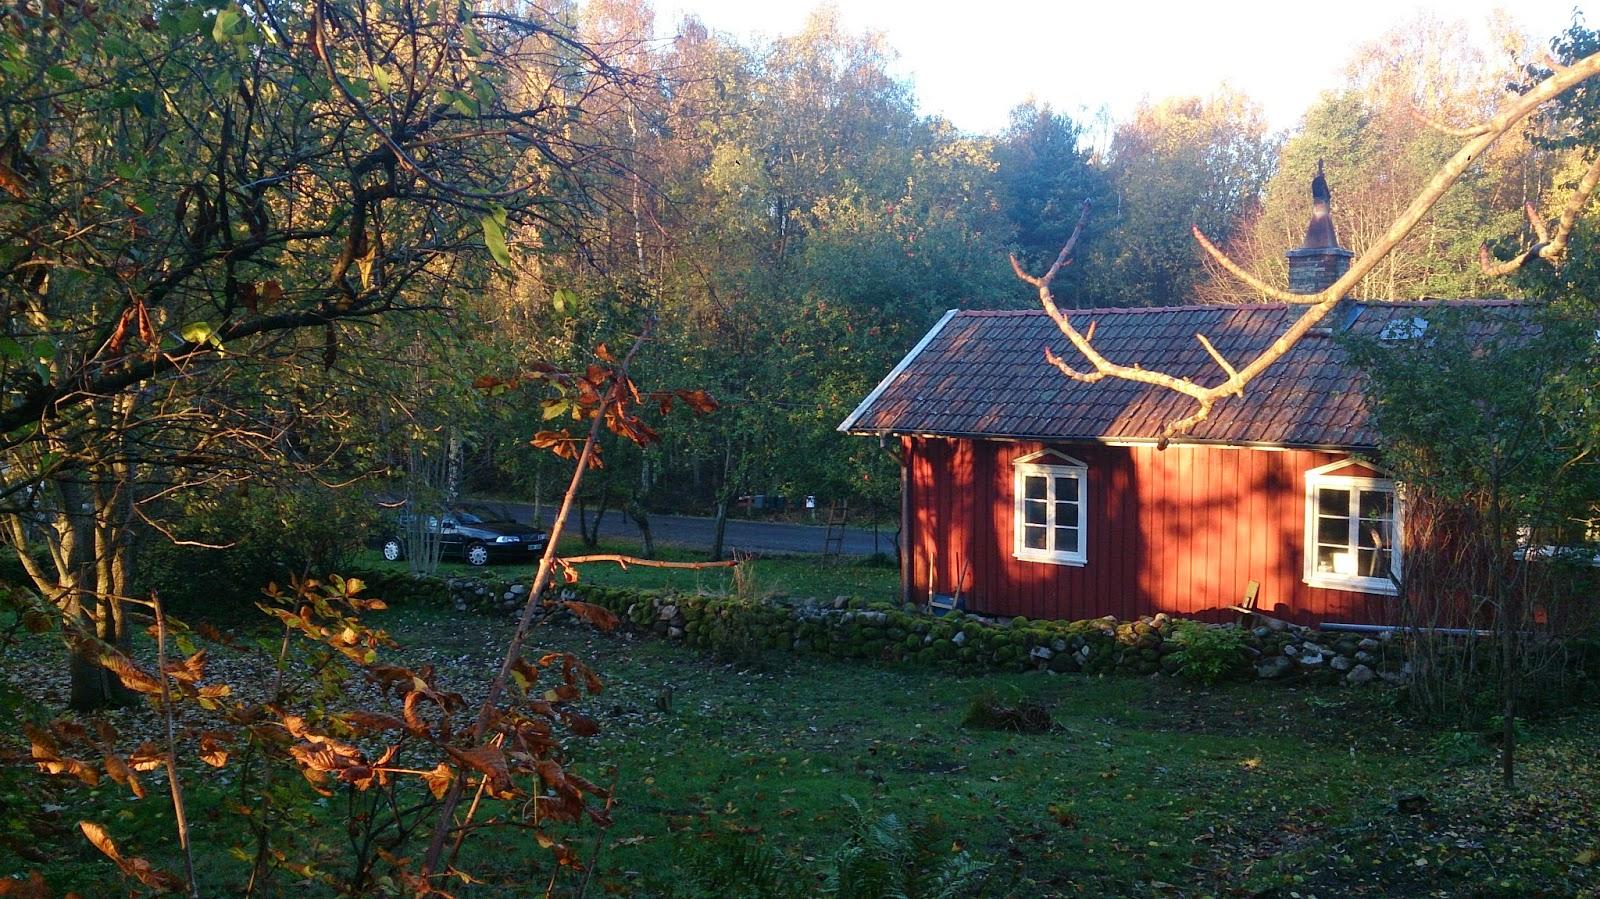 Torpet Svea - En dröm växer fram